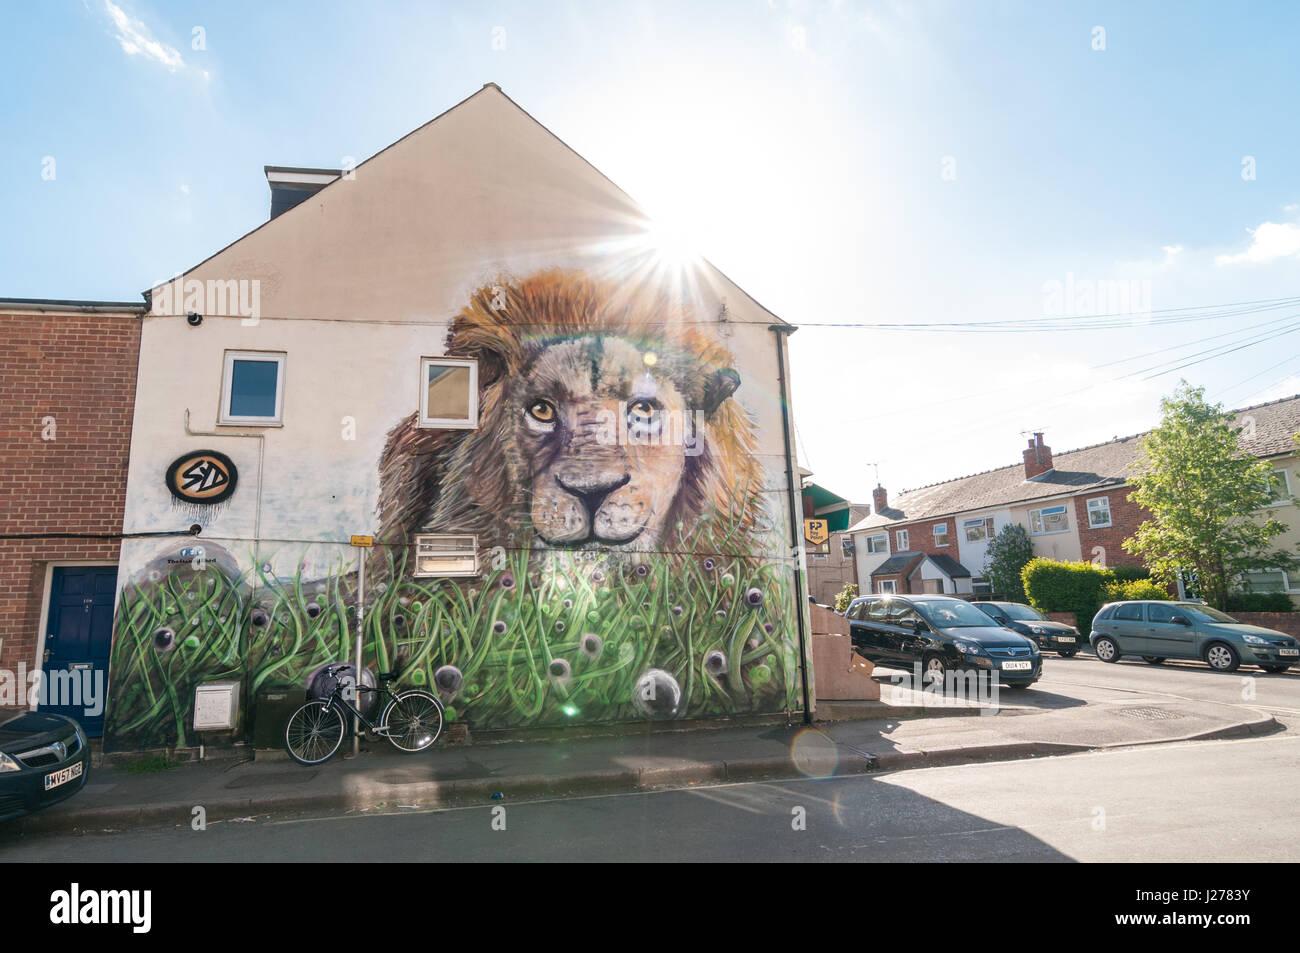 lion-mural-on-wall-in-east-oxford-united-kingdom-J2783Y.jpg